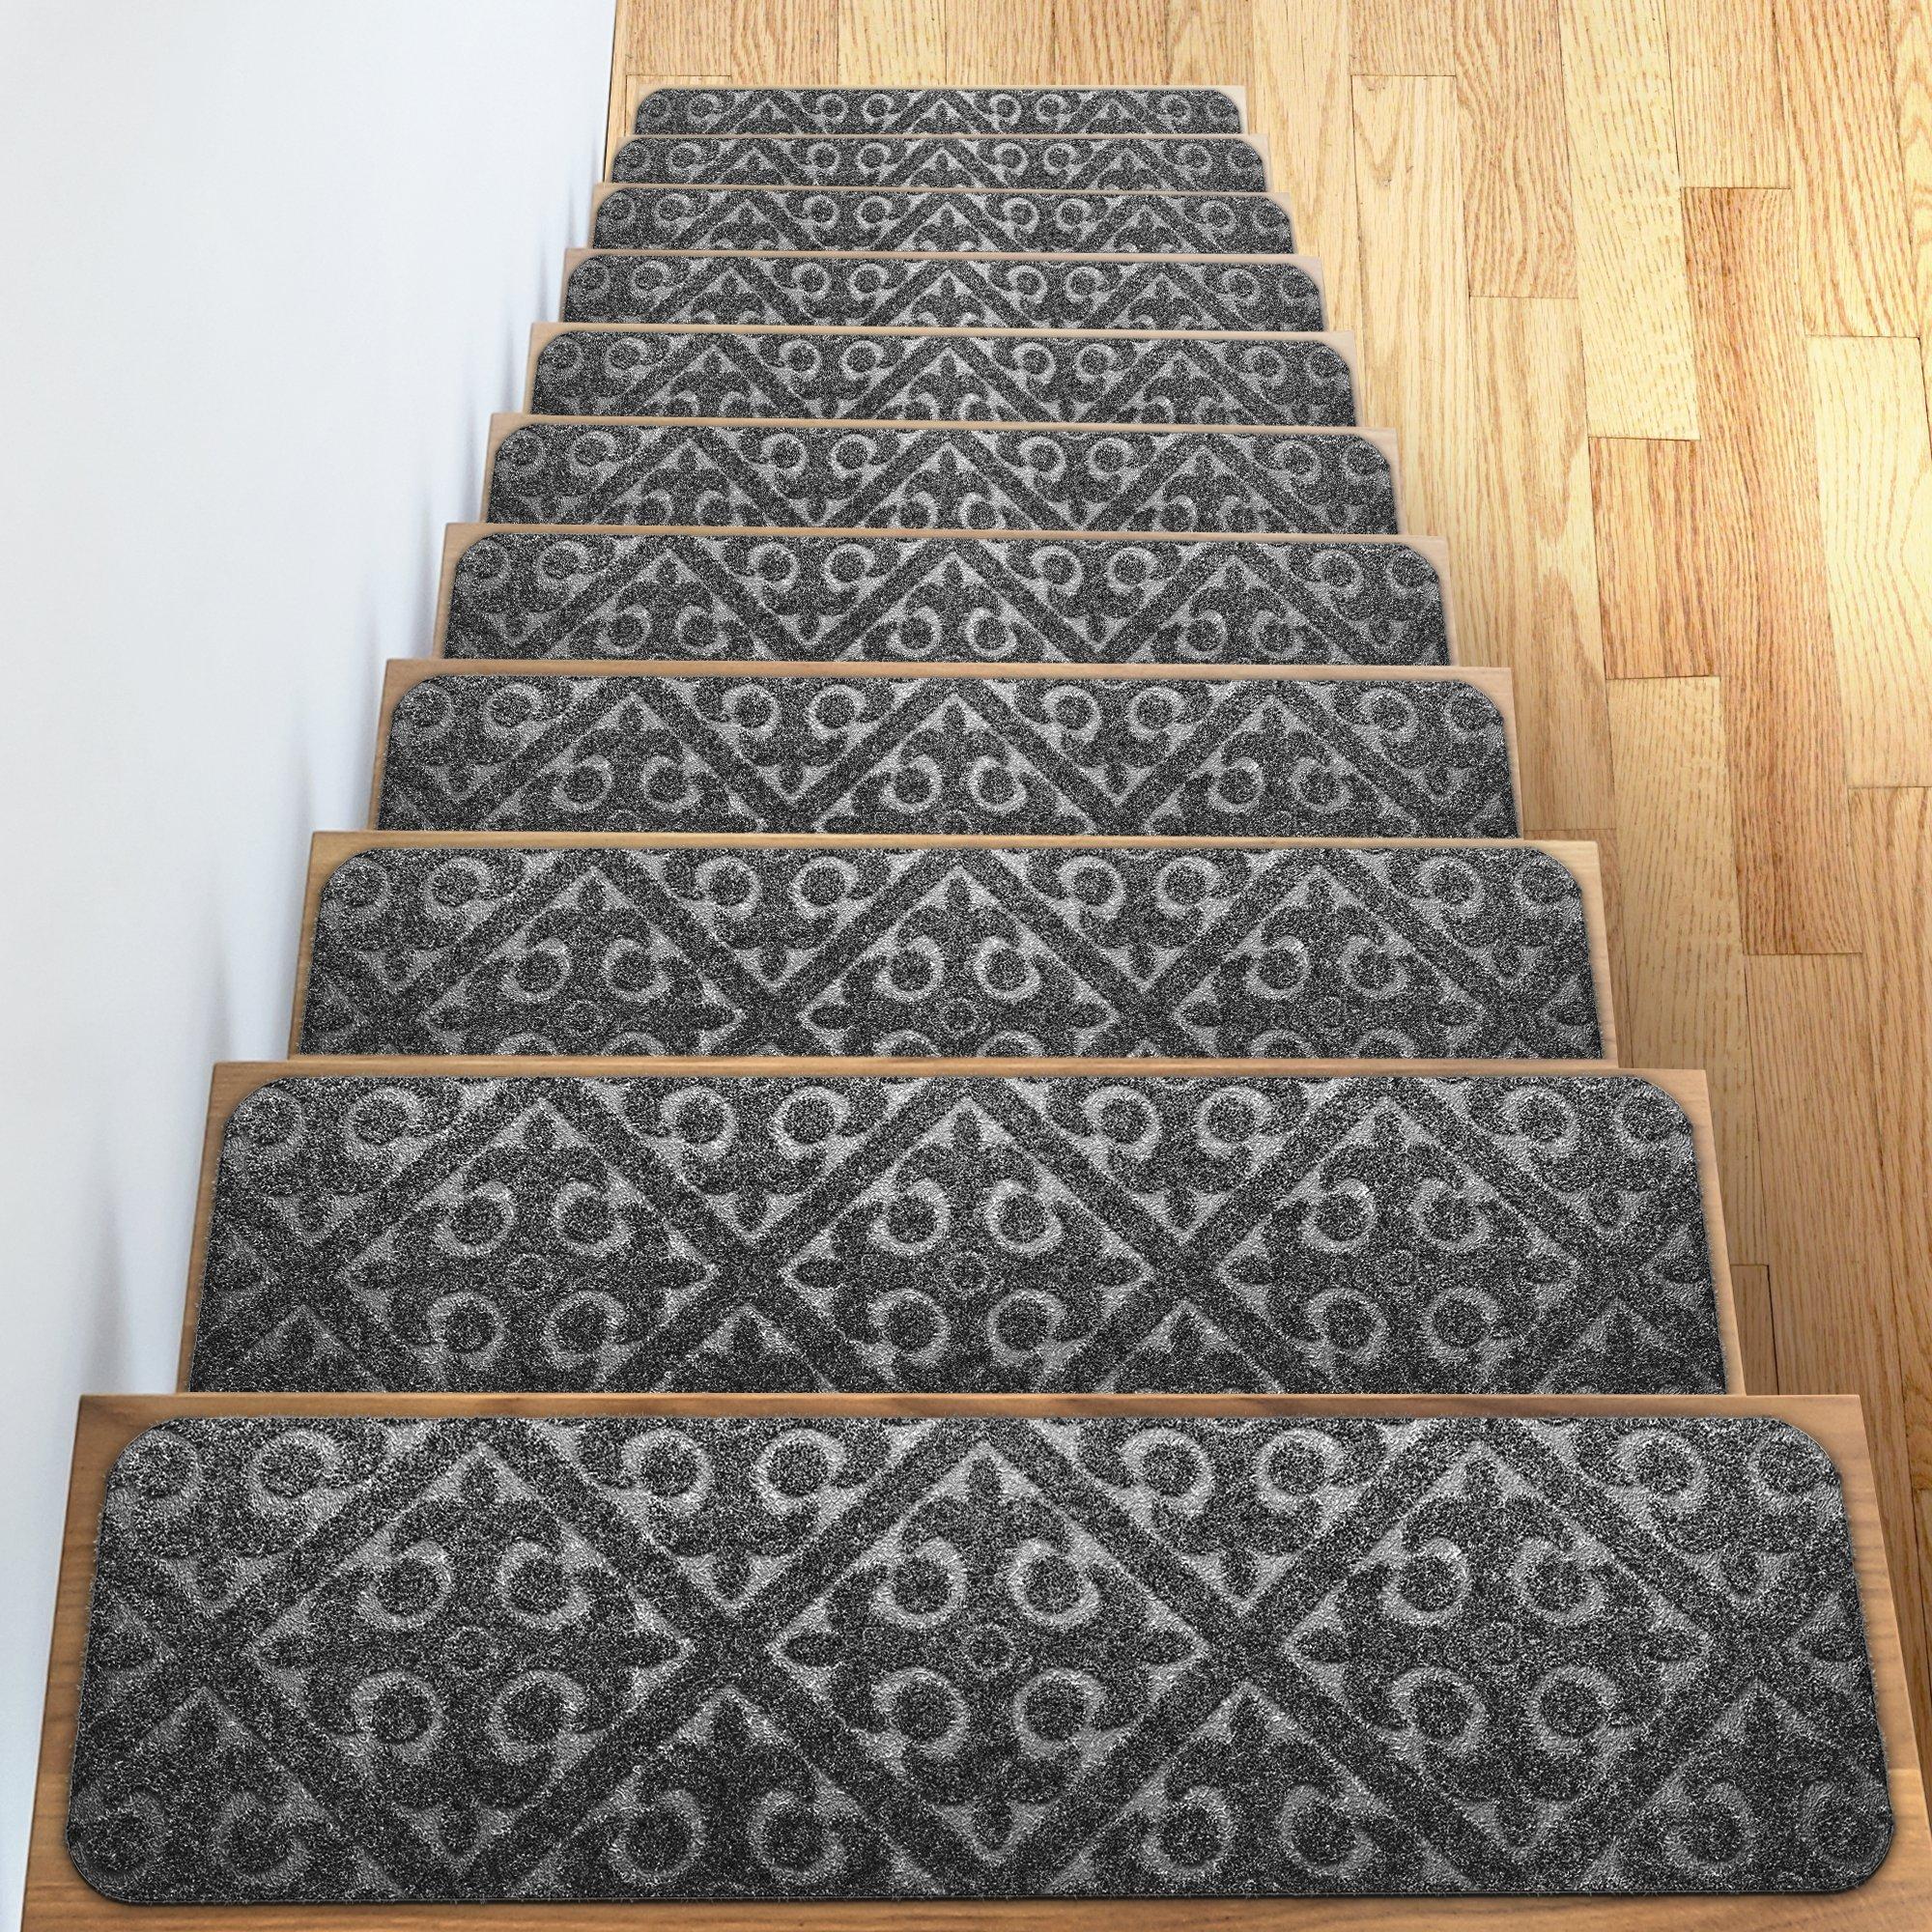 Elogio Carpet Stair Treads Set Of 13 Non Slip Skid Rubber